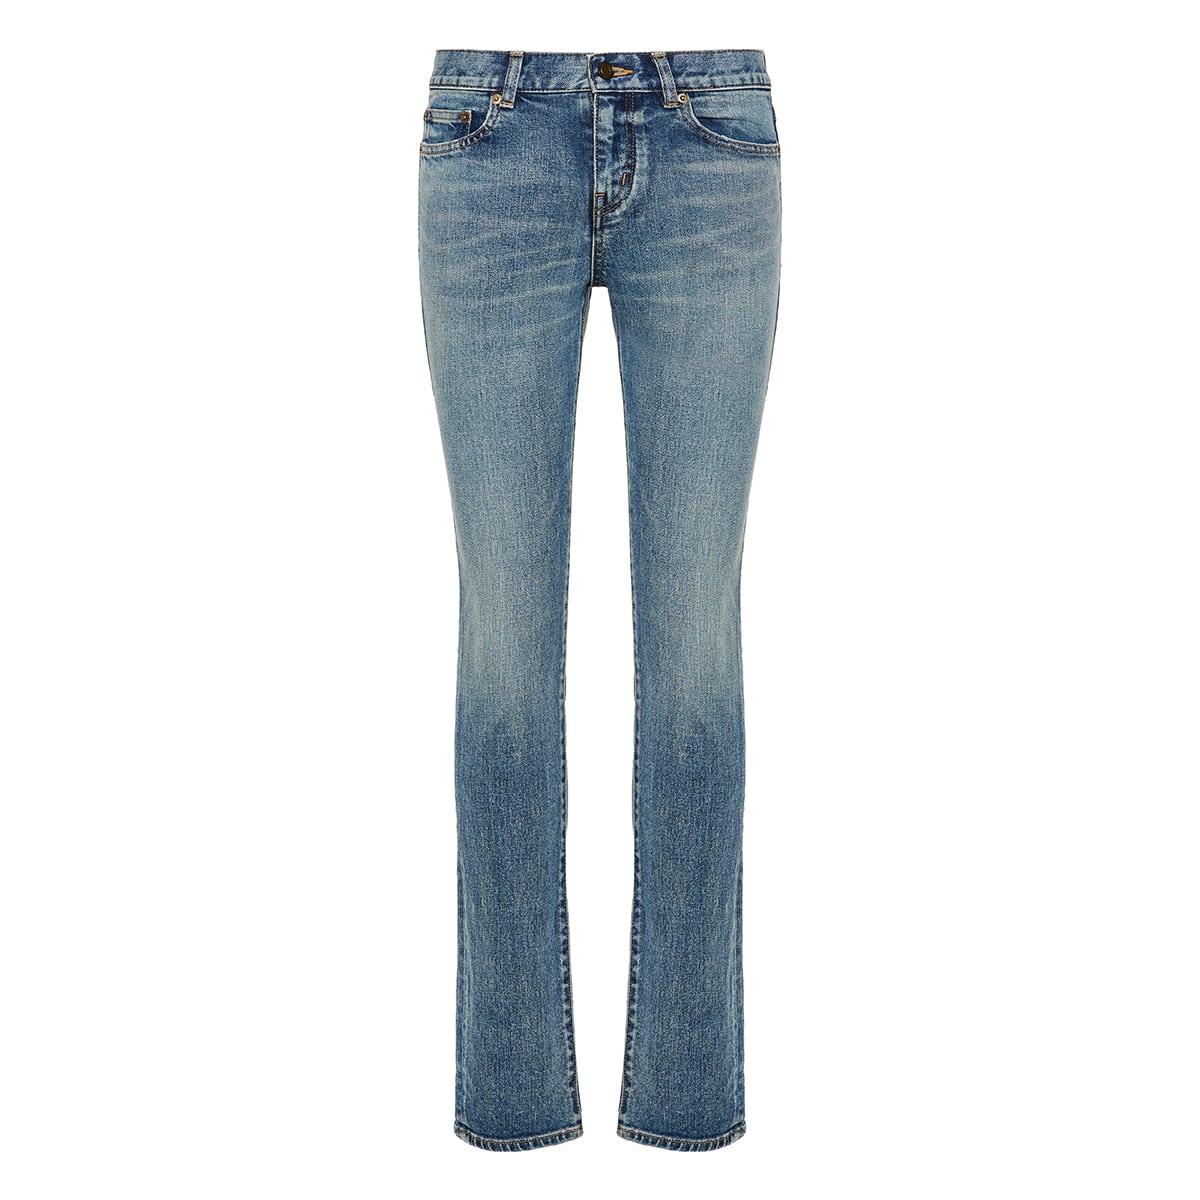 Low-waist distressed jeans